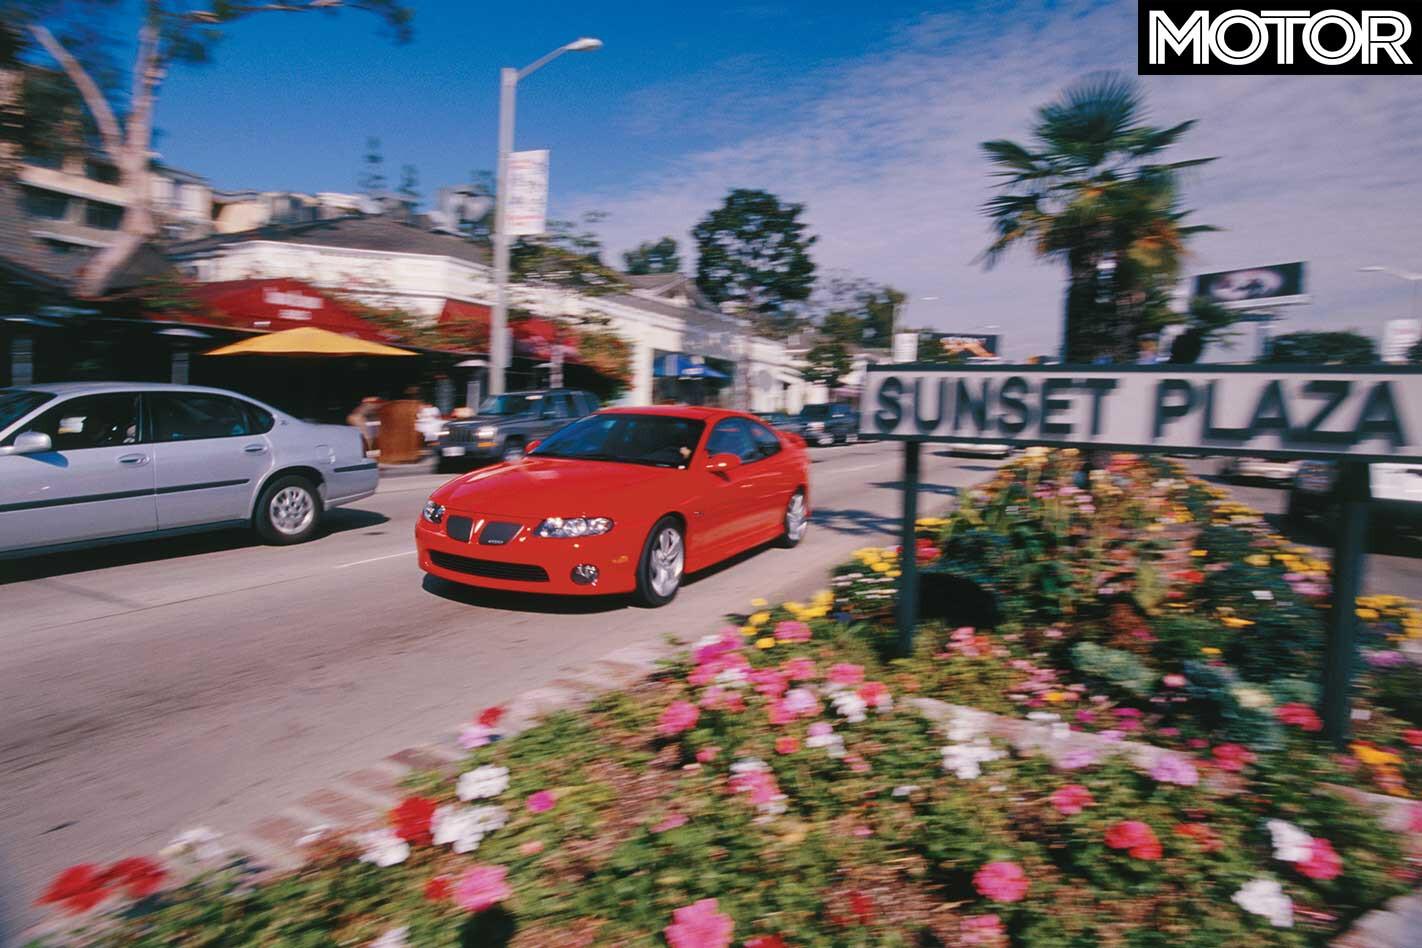 2004 Pontiac GTO Street Drive Jpg